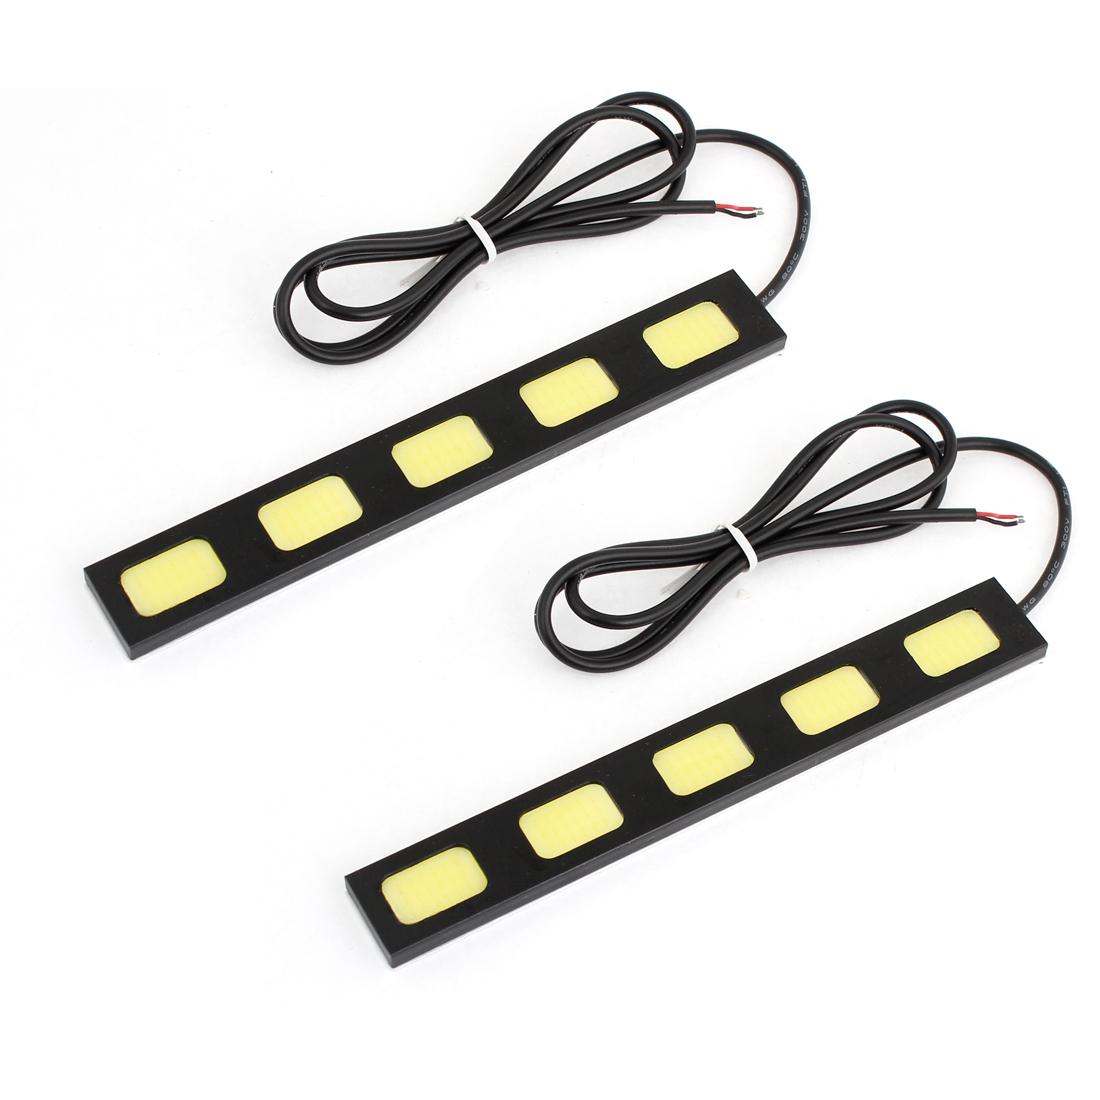 Car 15cm Length Adhesive Back White Lamp 5 LED Daytime Running Light 15W 2 Pcs